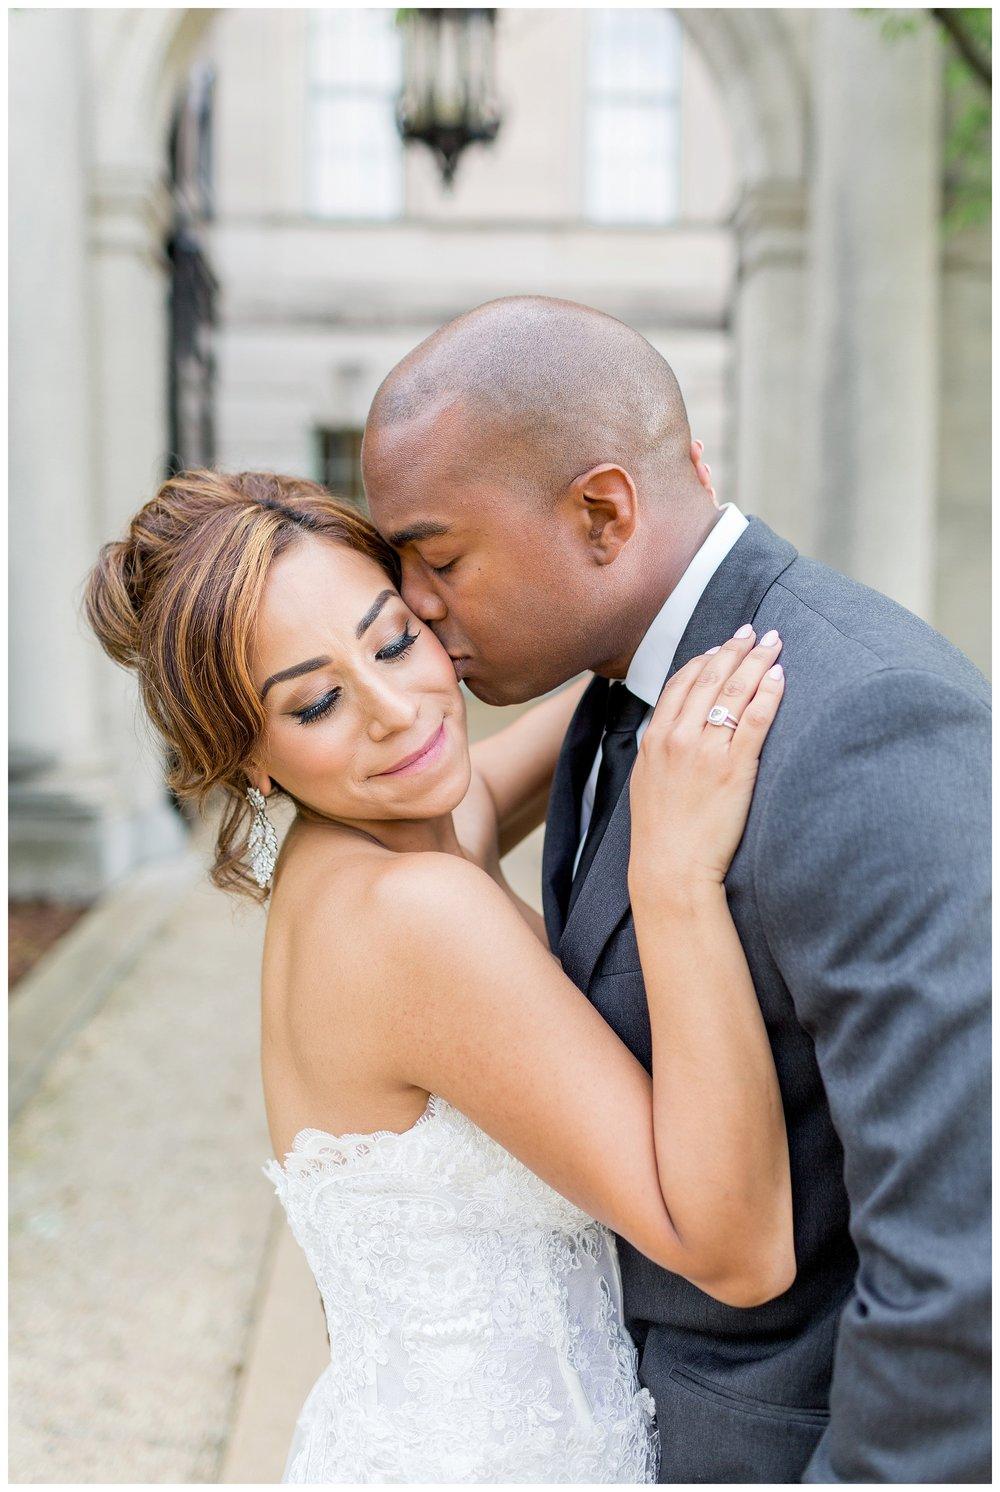 Anderson House Wedding DC Wedding Photographer Kir Tuben_0001.jpg